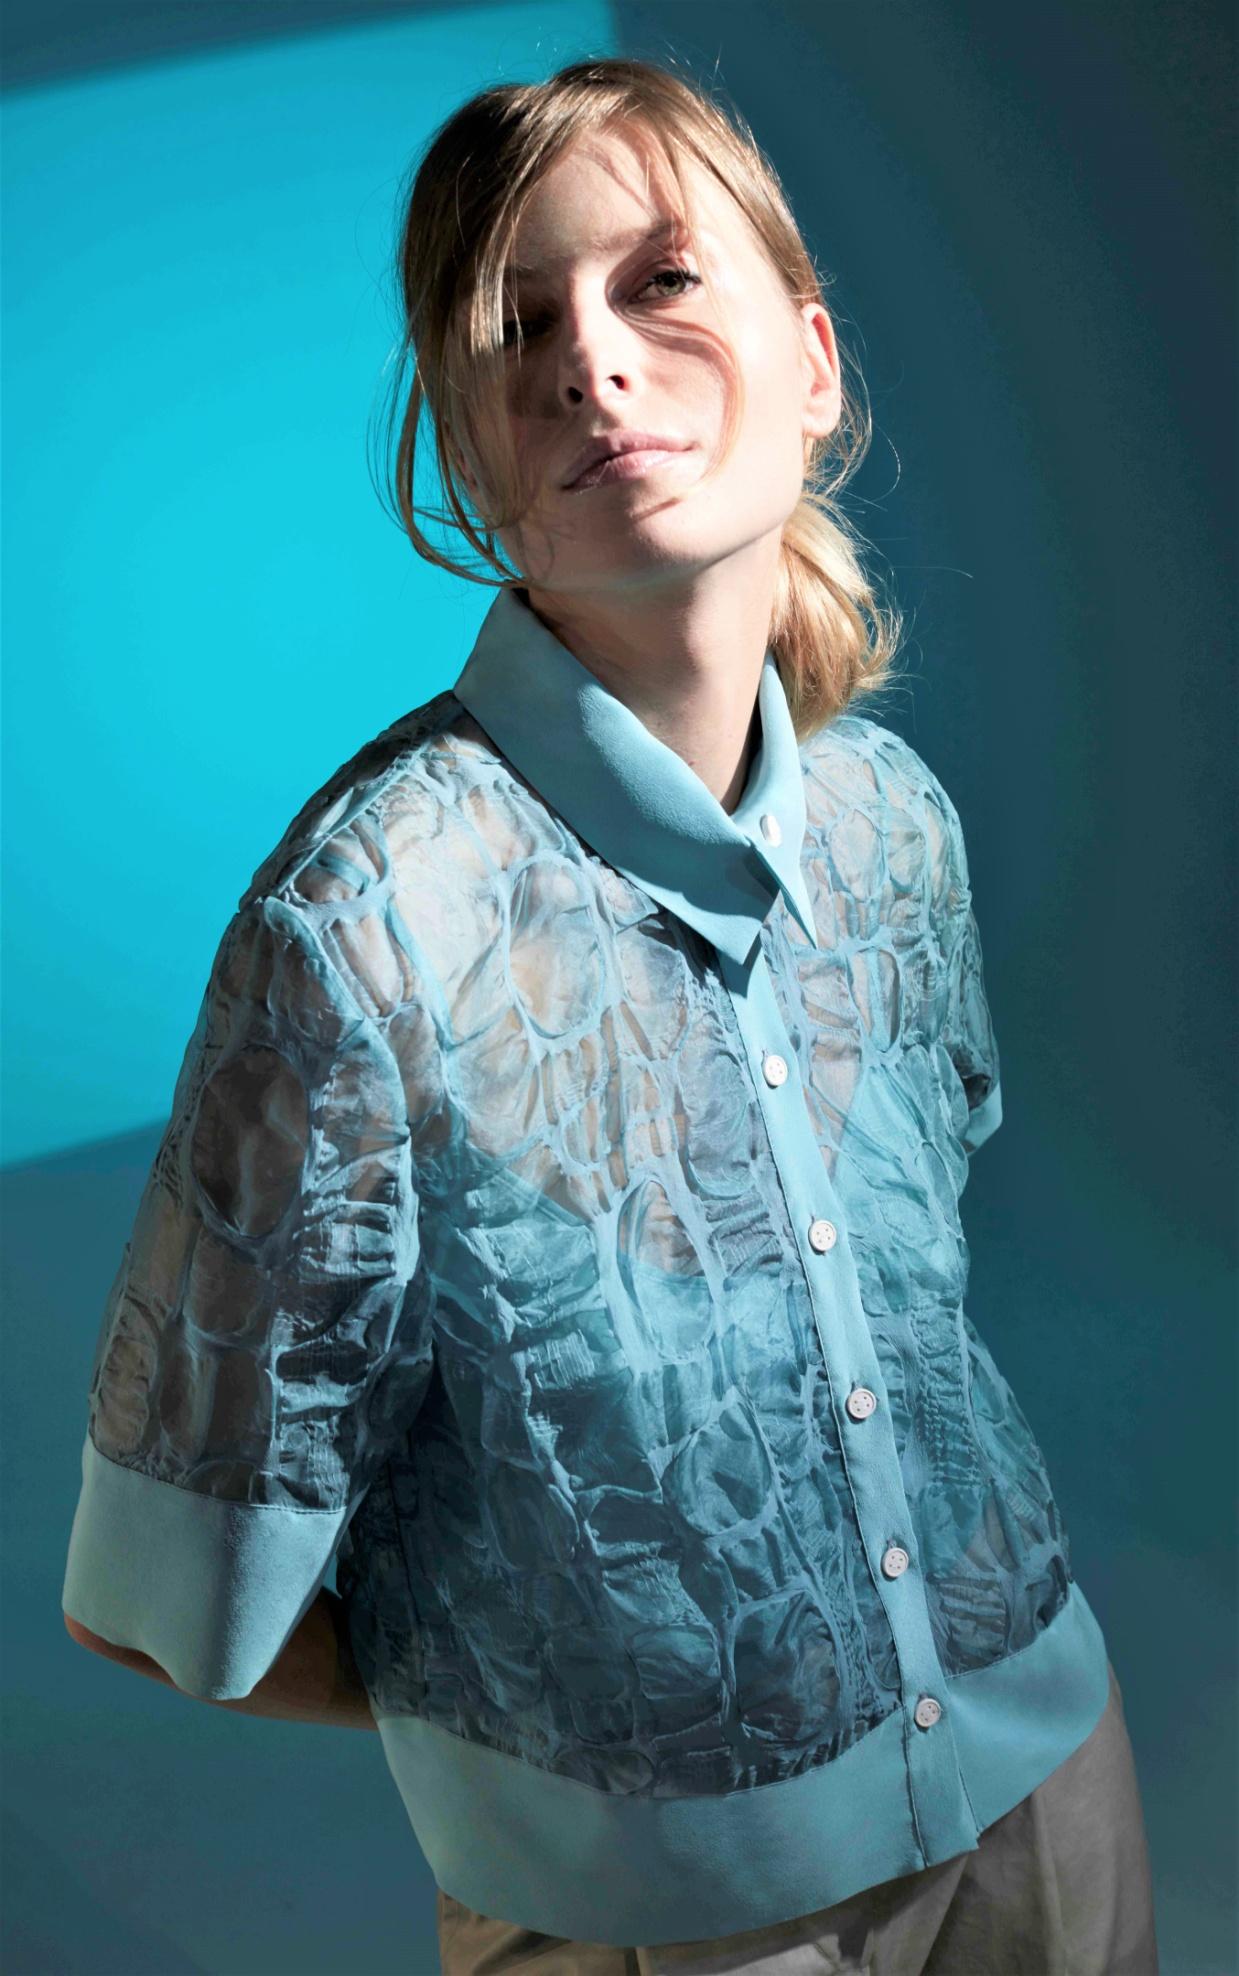 4.-bav-tailor sheer inserts blouse milan (2) cropped.jpg